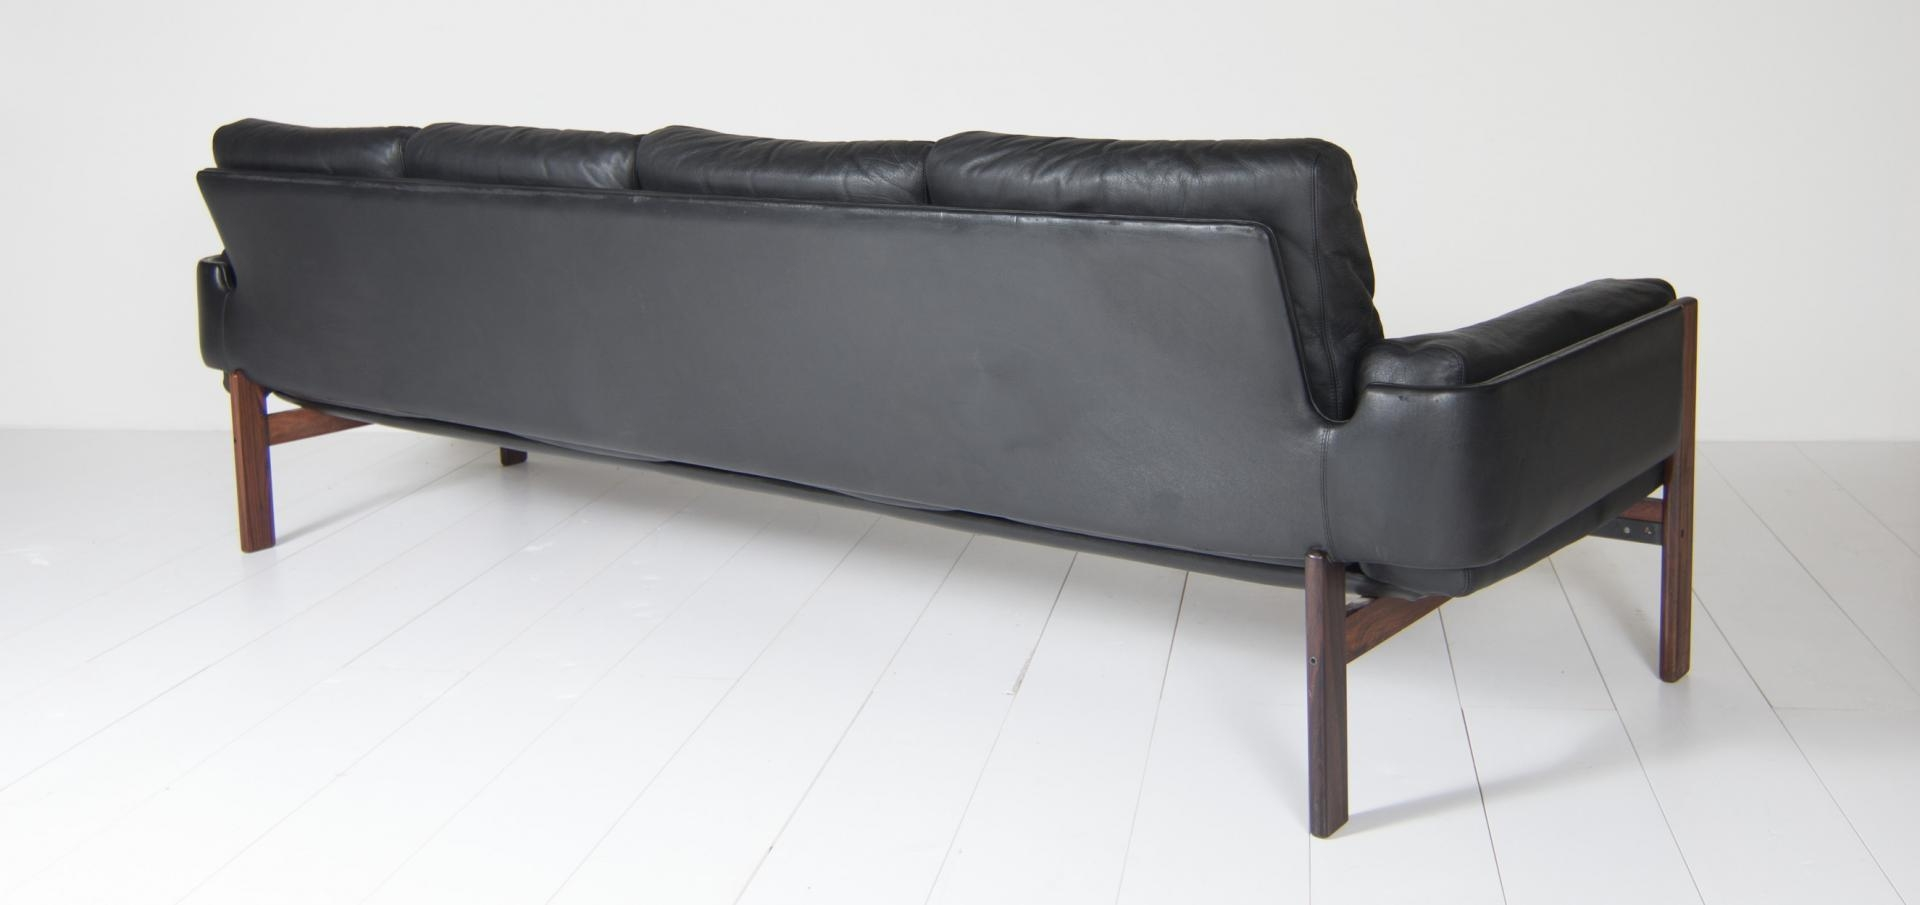 20 top 4 seat leather sofas sofa ideas. Black Bedroom Furniture Sets. Home Design Ideas